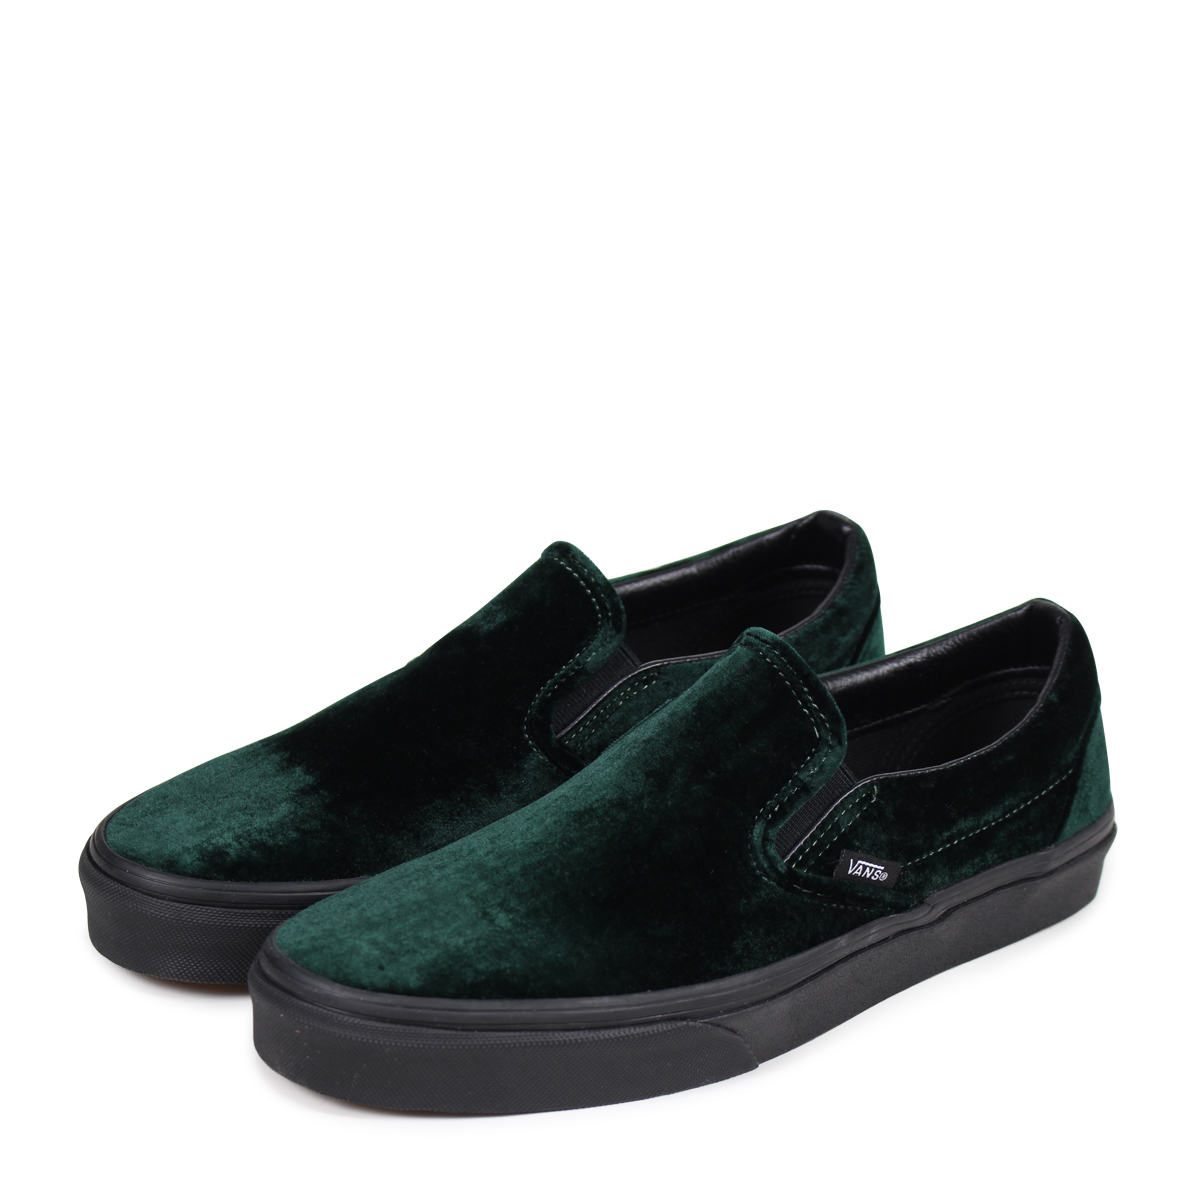 ec7b042099 ALLSPORTS  VANS CLASSIC SLIP-ON slip-ons sneakers men gap Dis vans ...